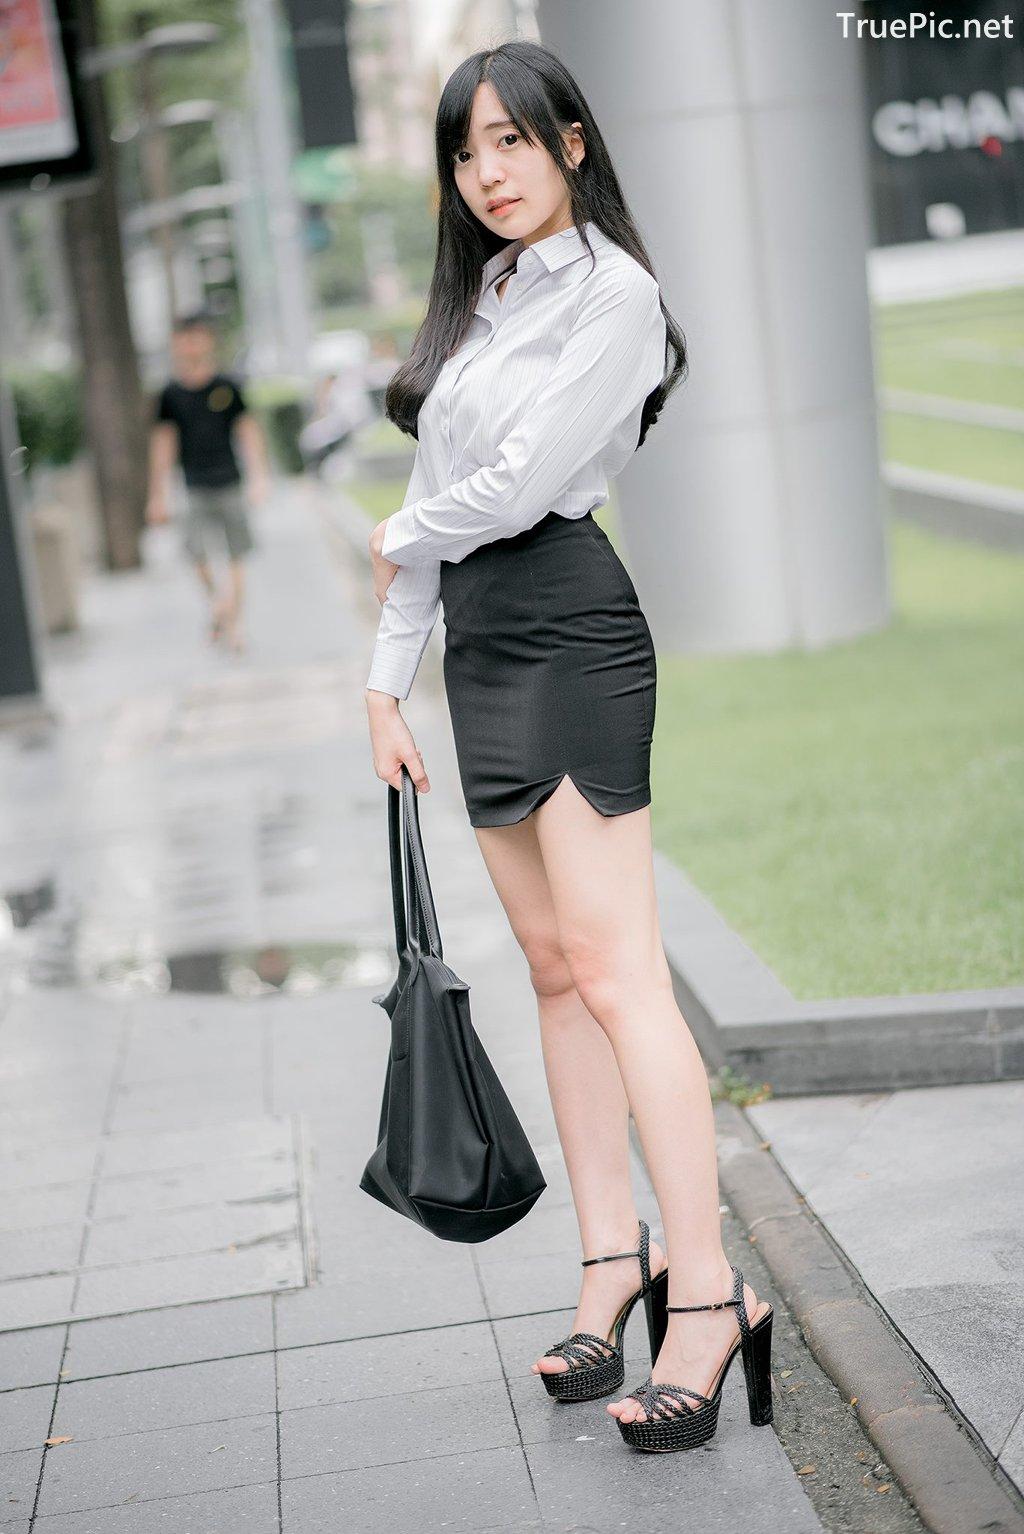 Image Thailand Model - Sarunrat Baifern Ong - Concept Kim's Secretary - TruePic.net - Picture-4